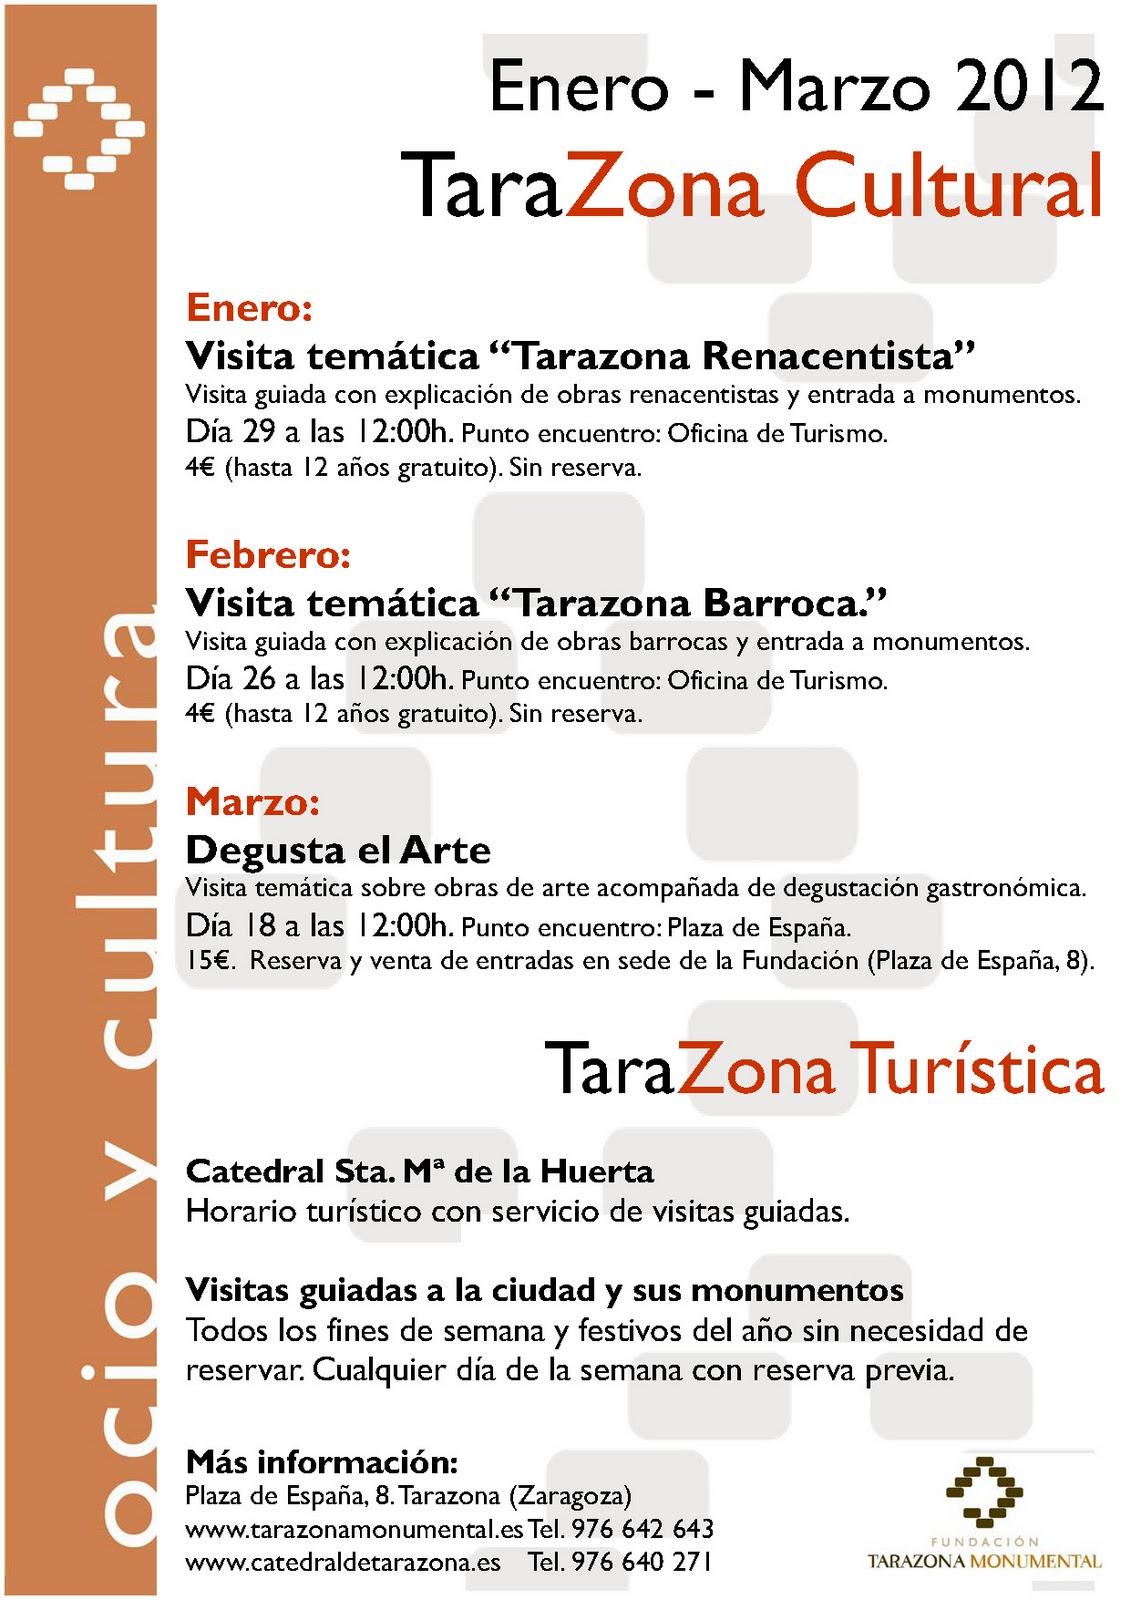 Rincones de zaragoza for Oficina turismo tarazona